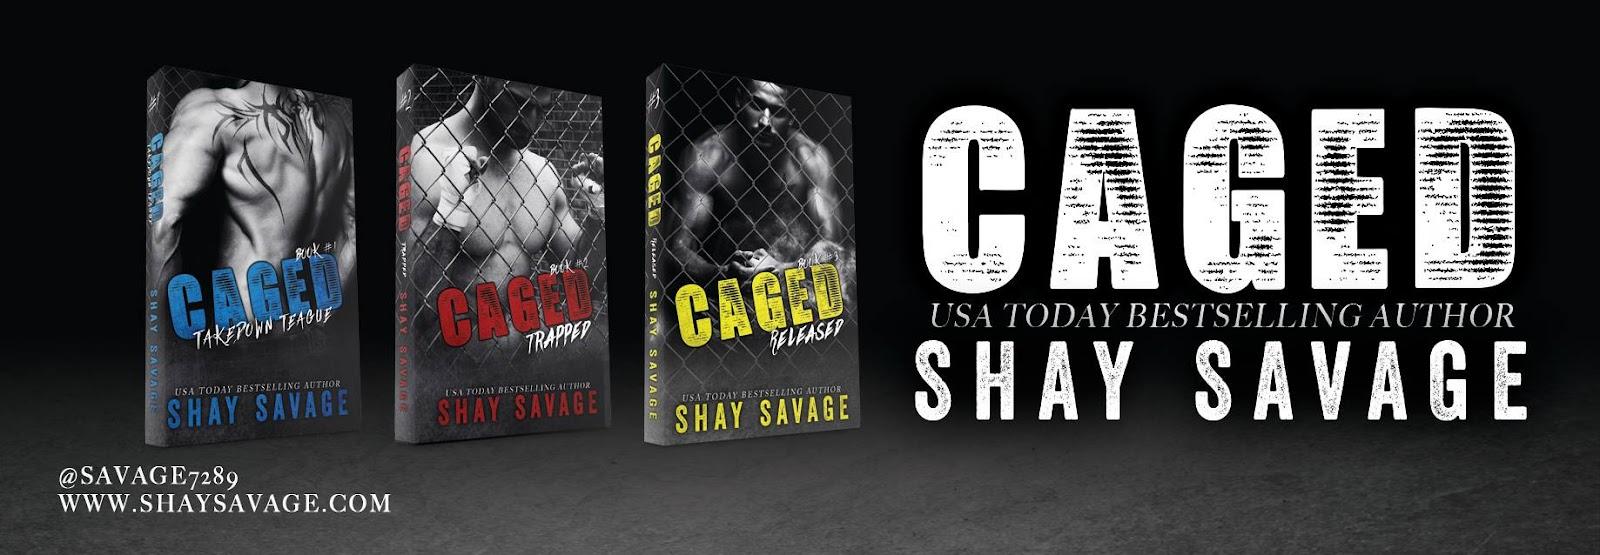 caged series.jpg